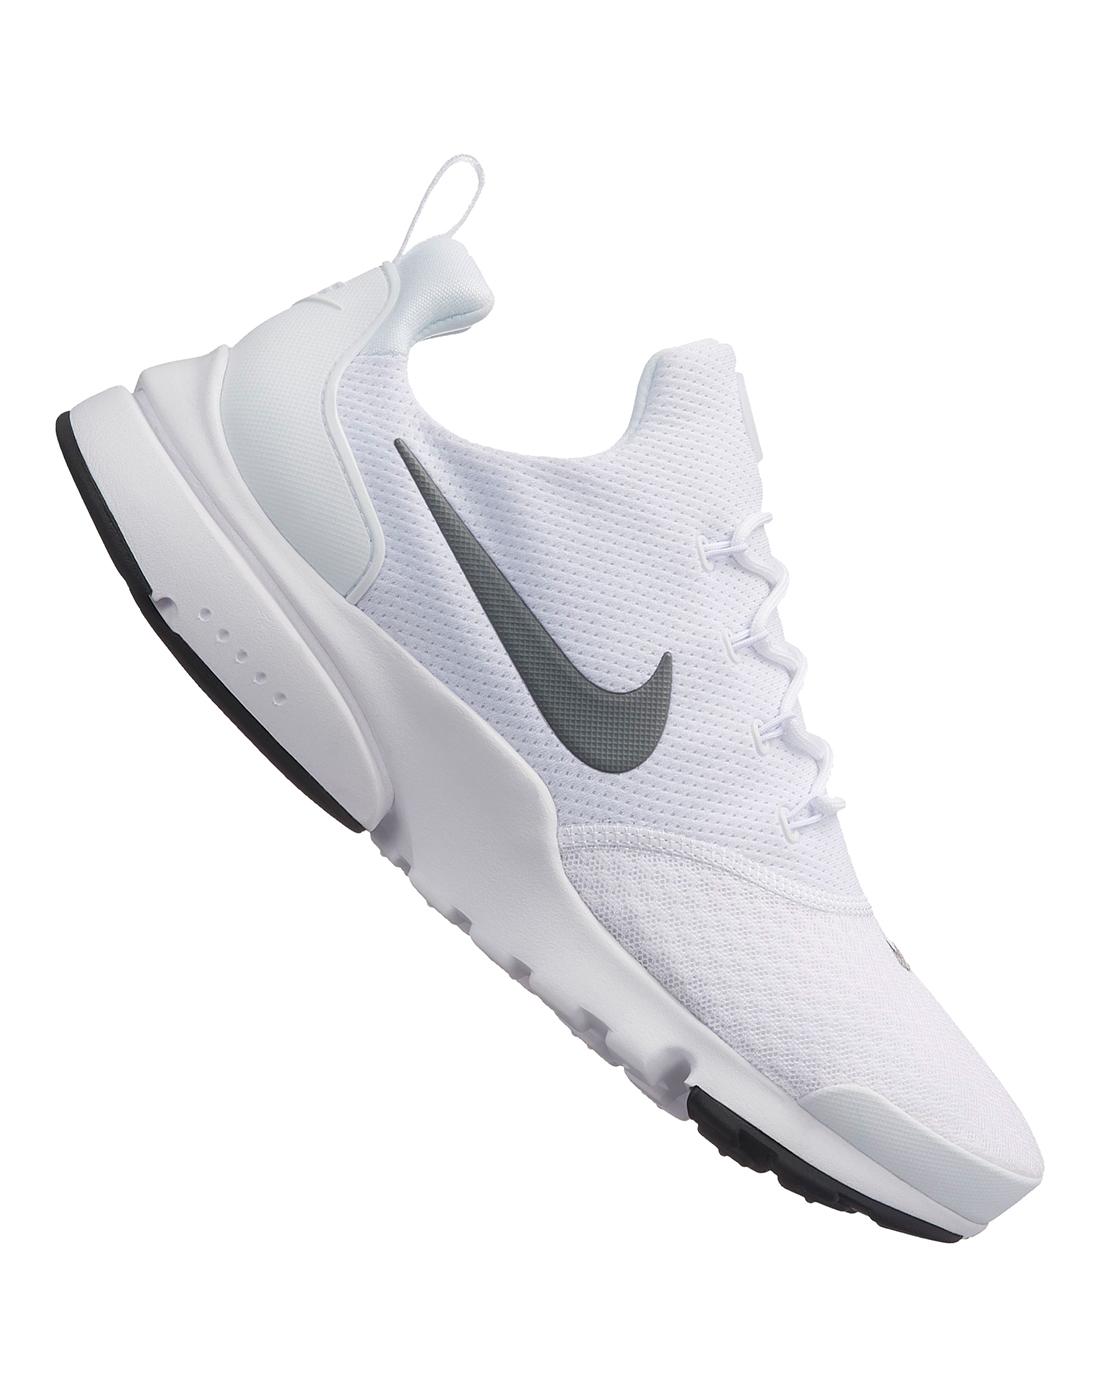 499402ccdbbf6 Men s White Nike Presto Fly